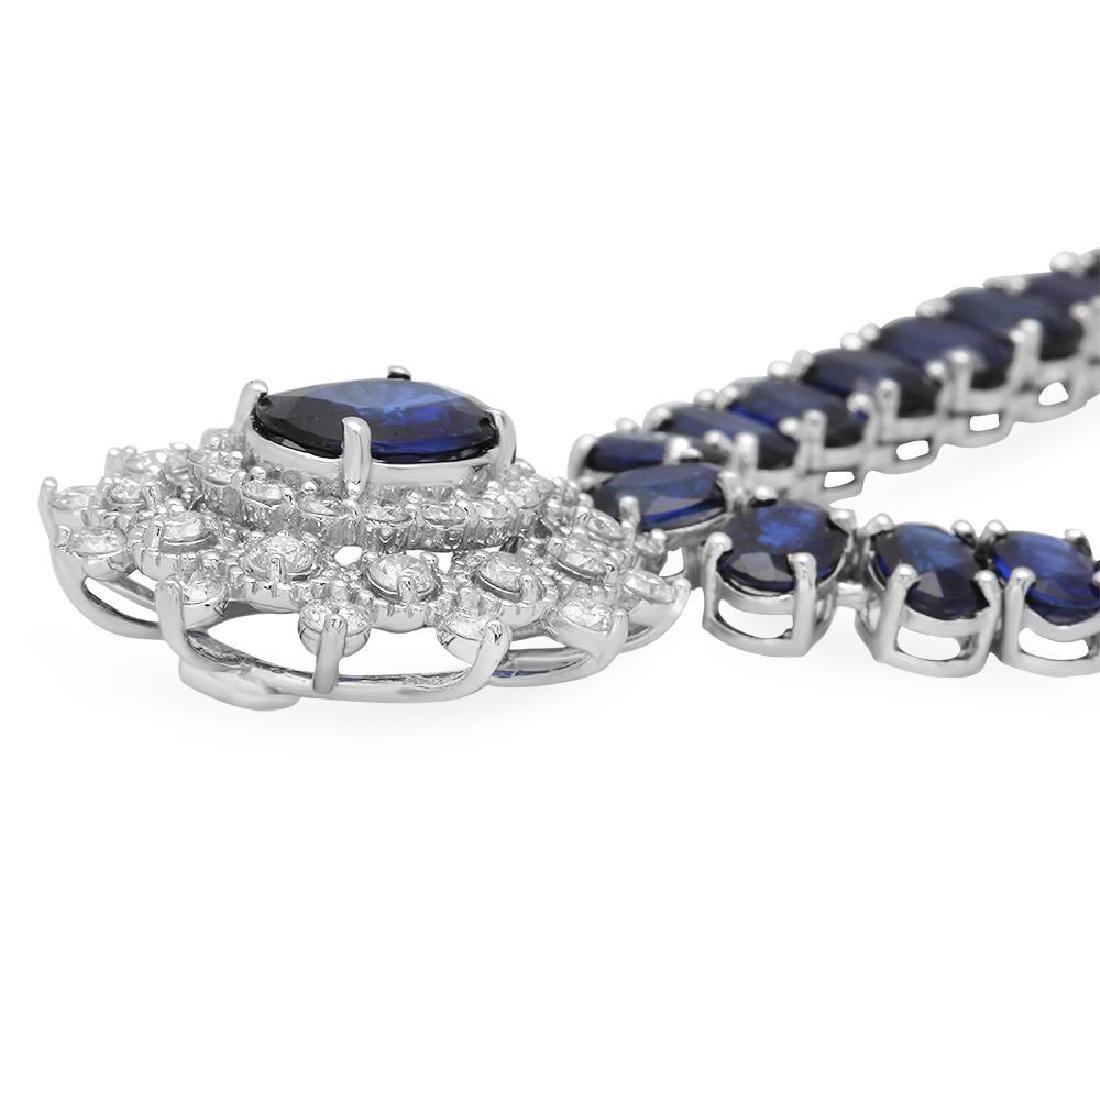 14K Gold 54.01ct Sapphire 2.67ct Diamond Necklace - 2